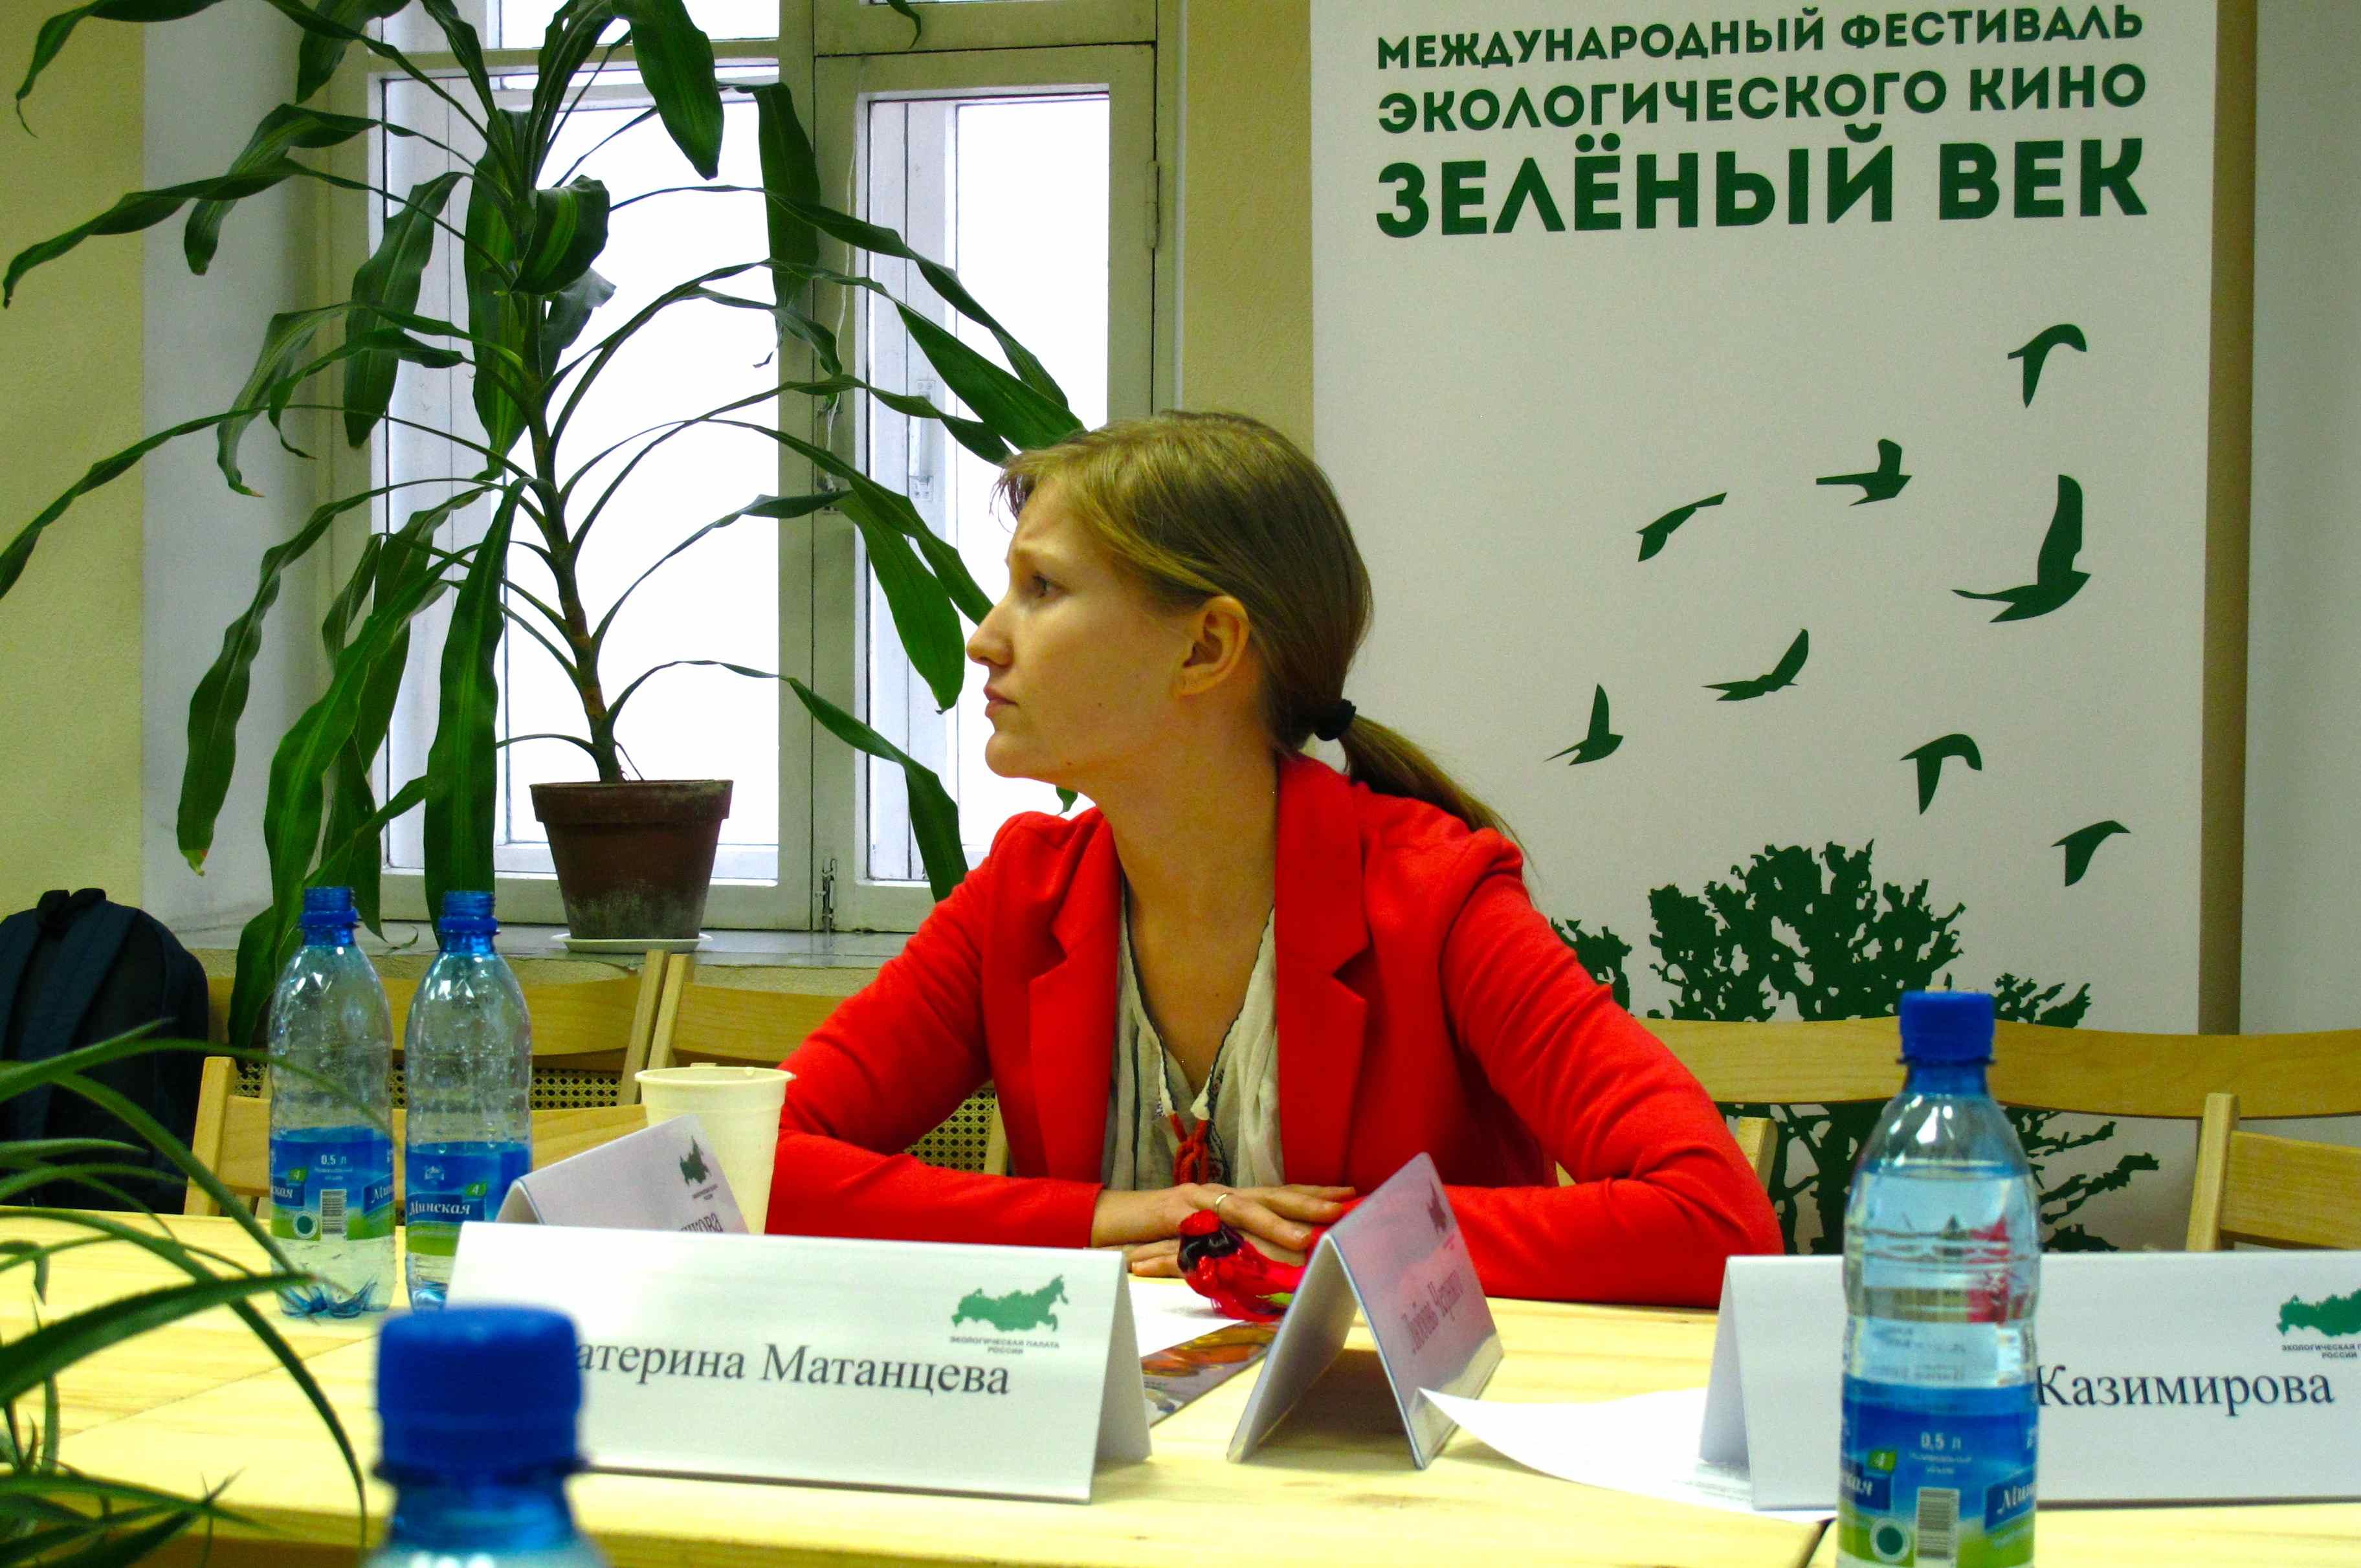 Екатерина Матанцева, основательница компании МиКо